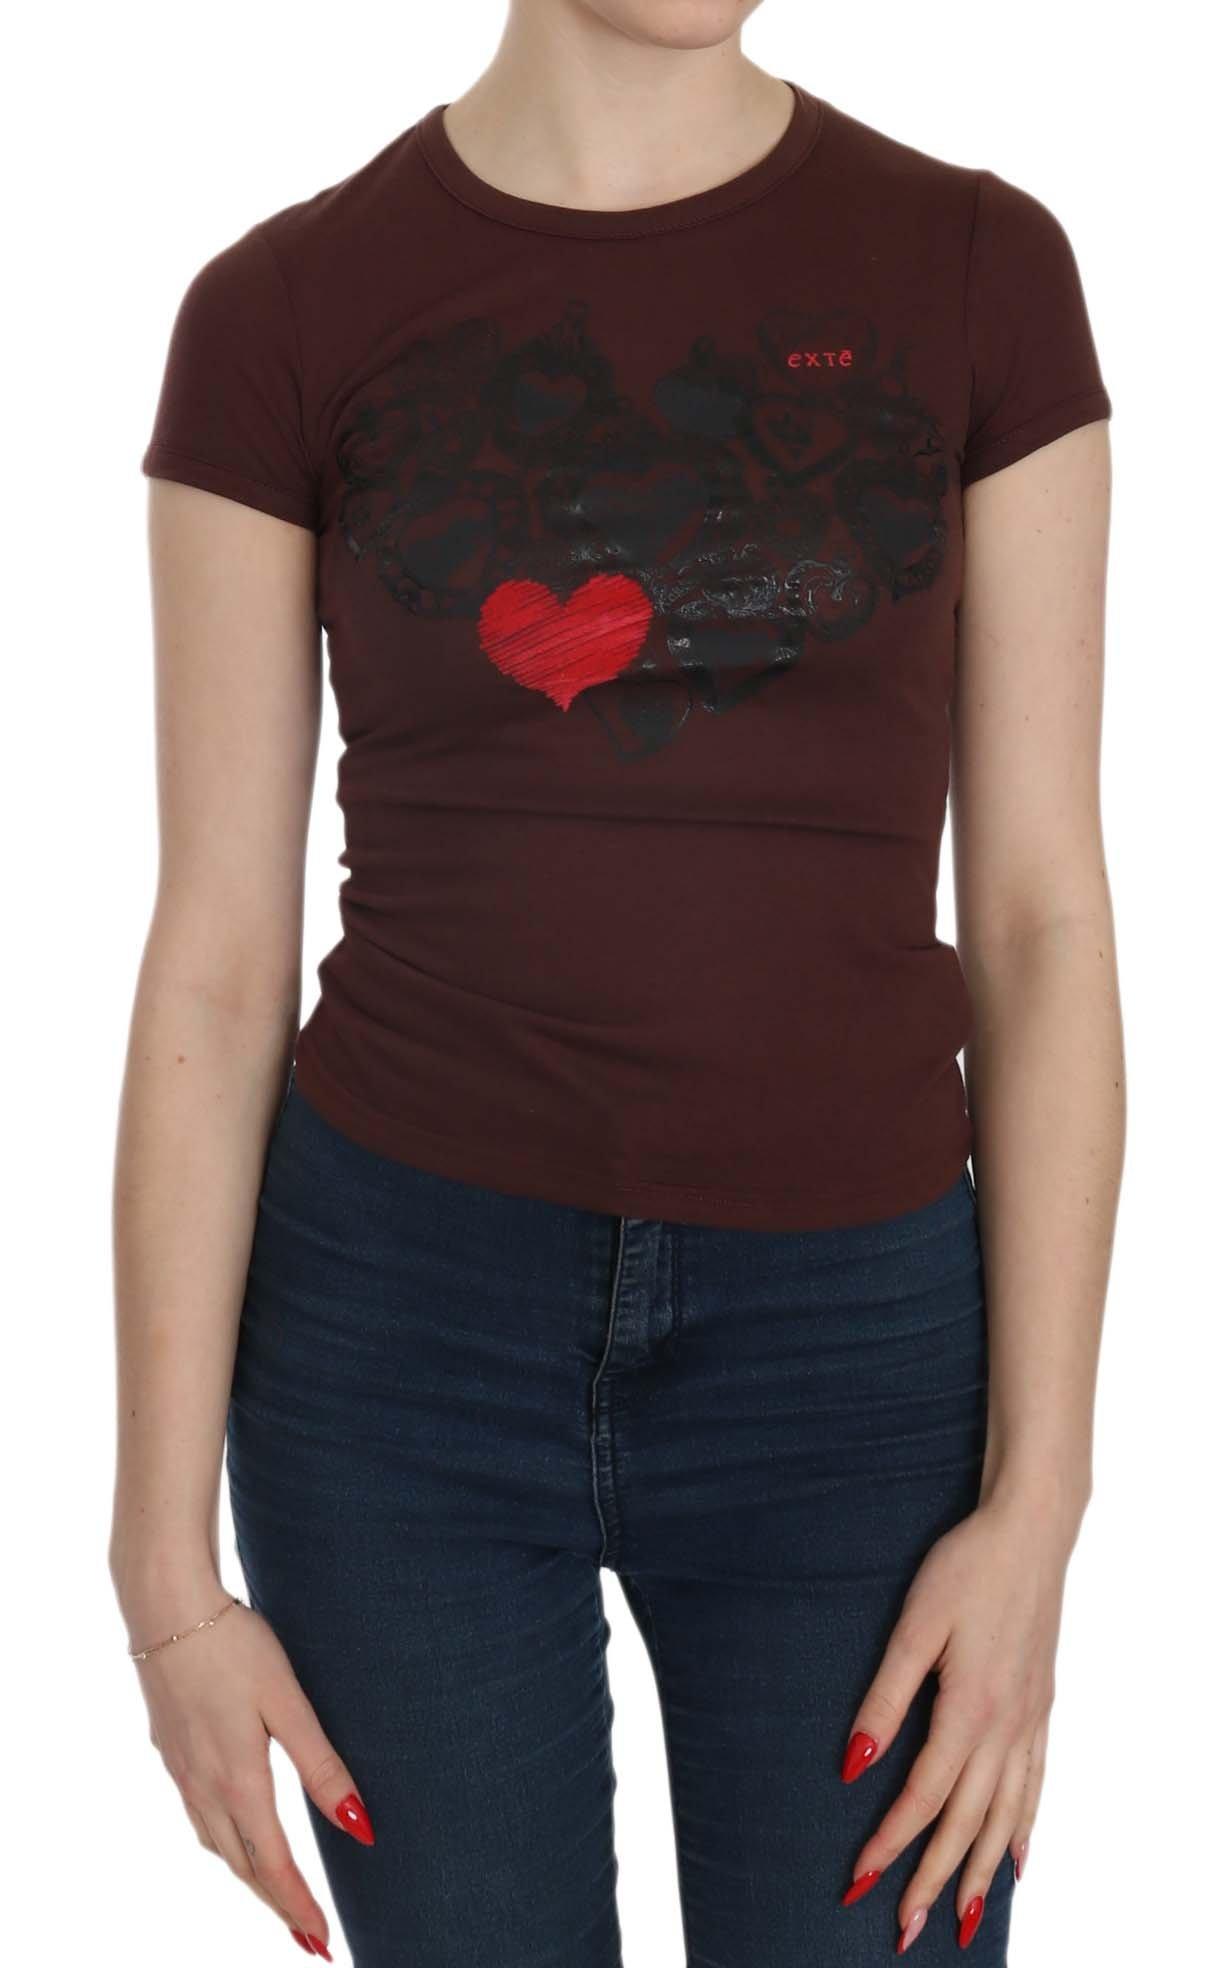 Exte Women's Hearts SS Casual T-shirt Top Brown TSH3909 - IT38|XS